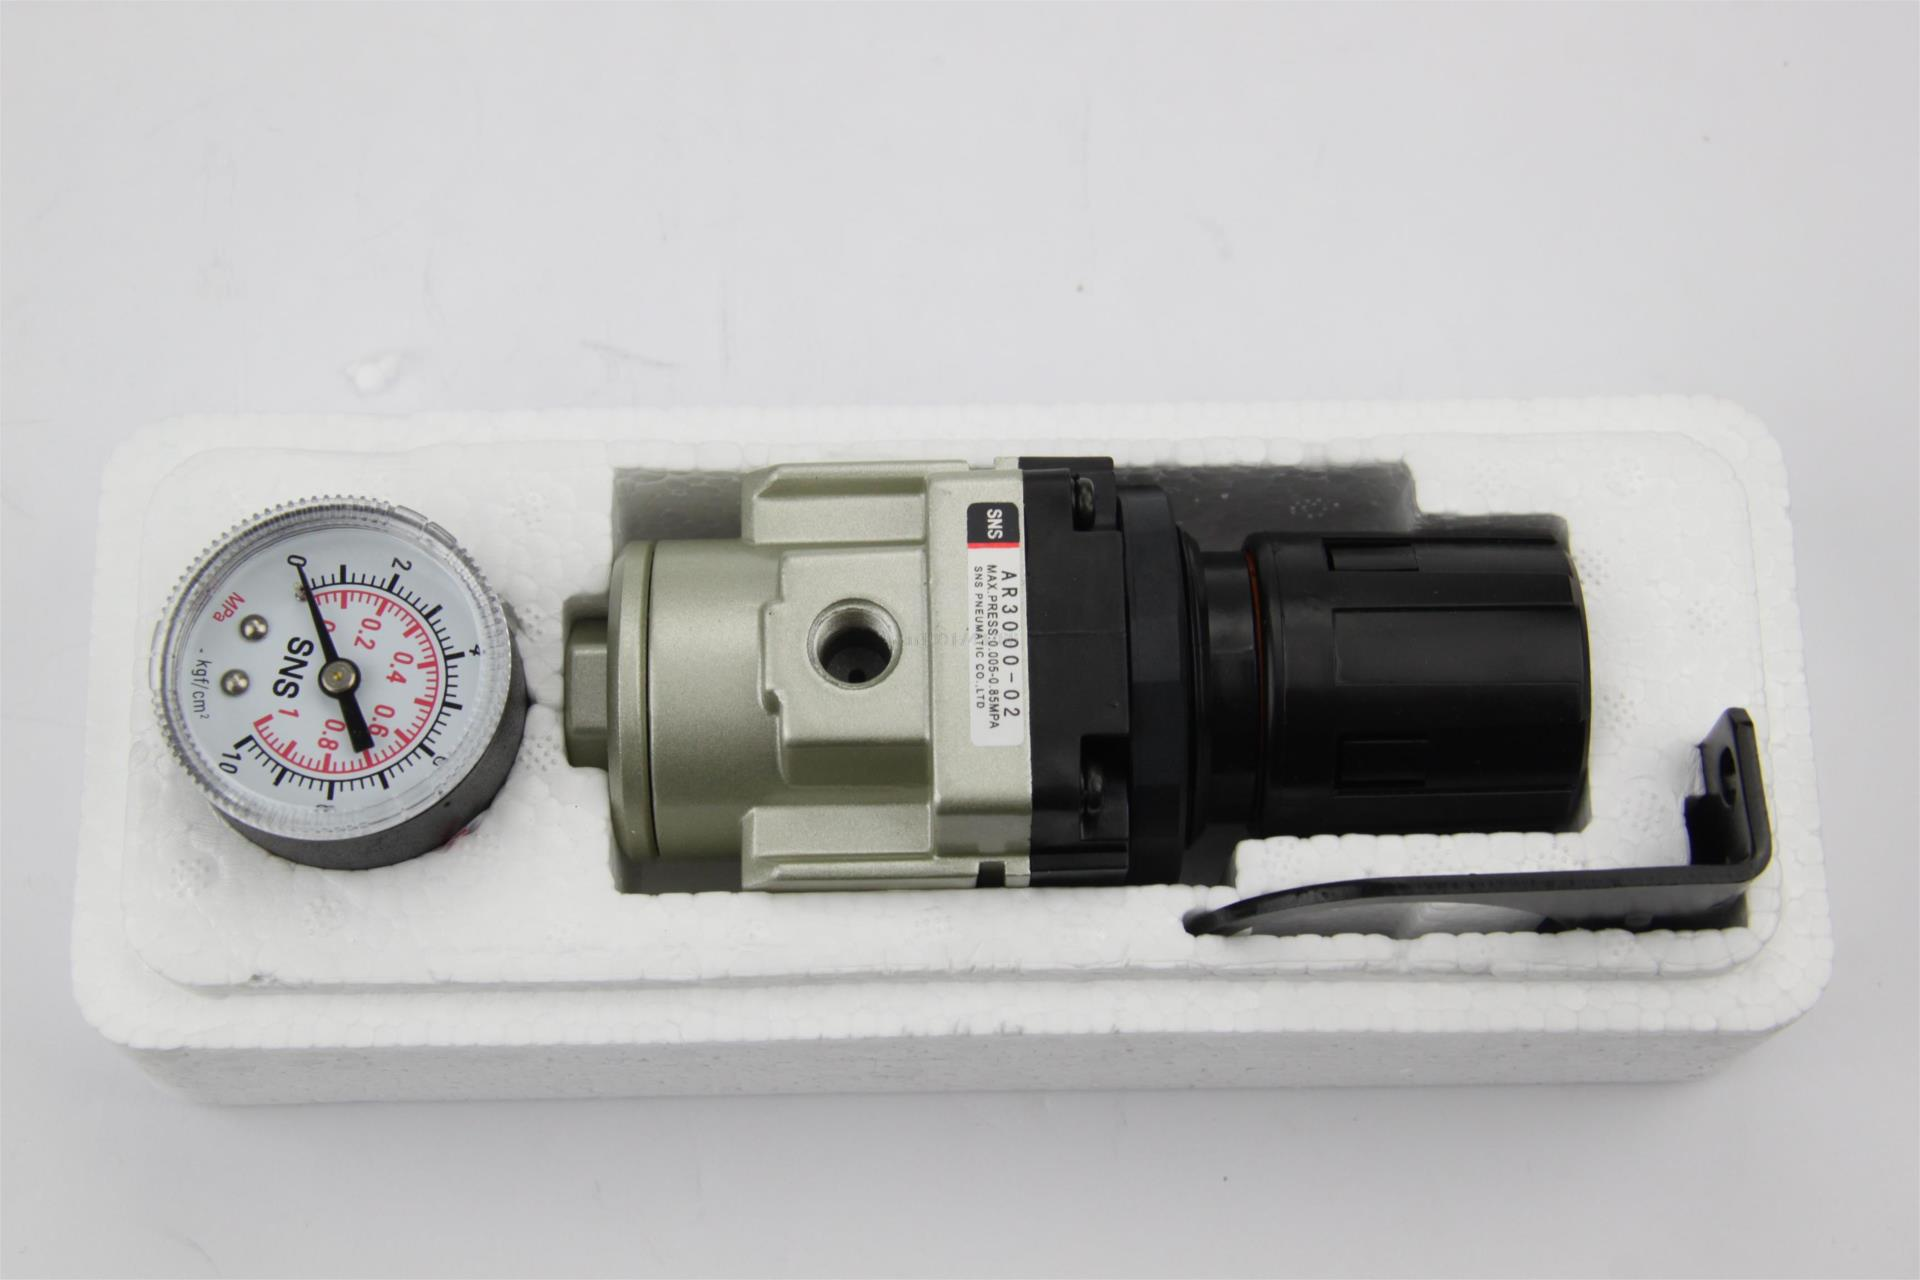 AR3000-02 1/4''BSPT regulator compress pressure reducer valve  SNS pneumatic components rice cooker parts steam pressure release valve